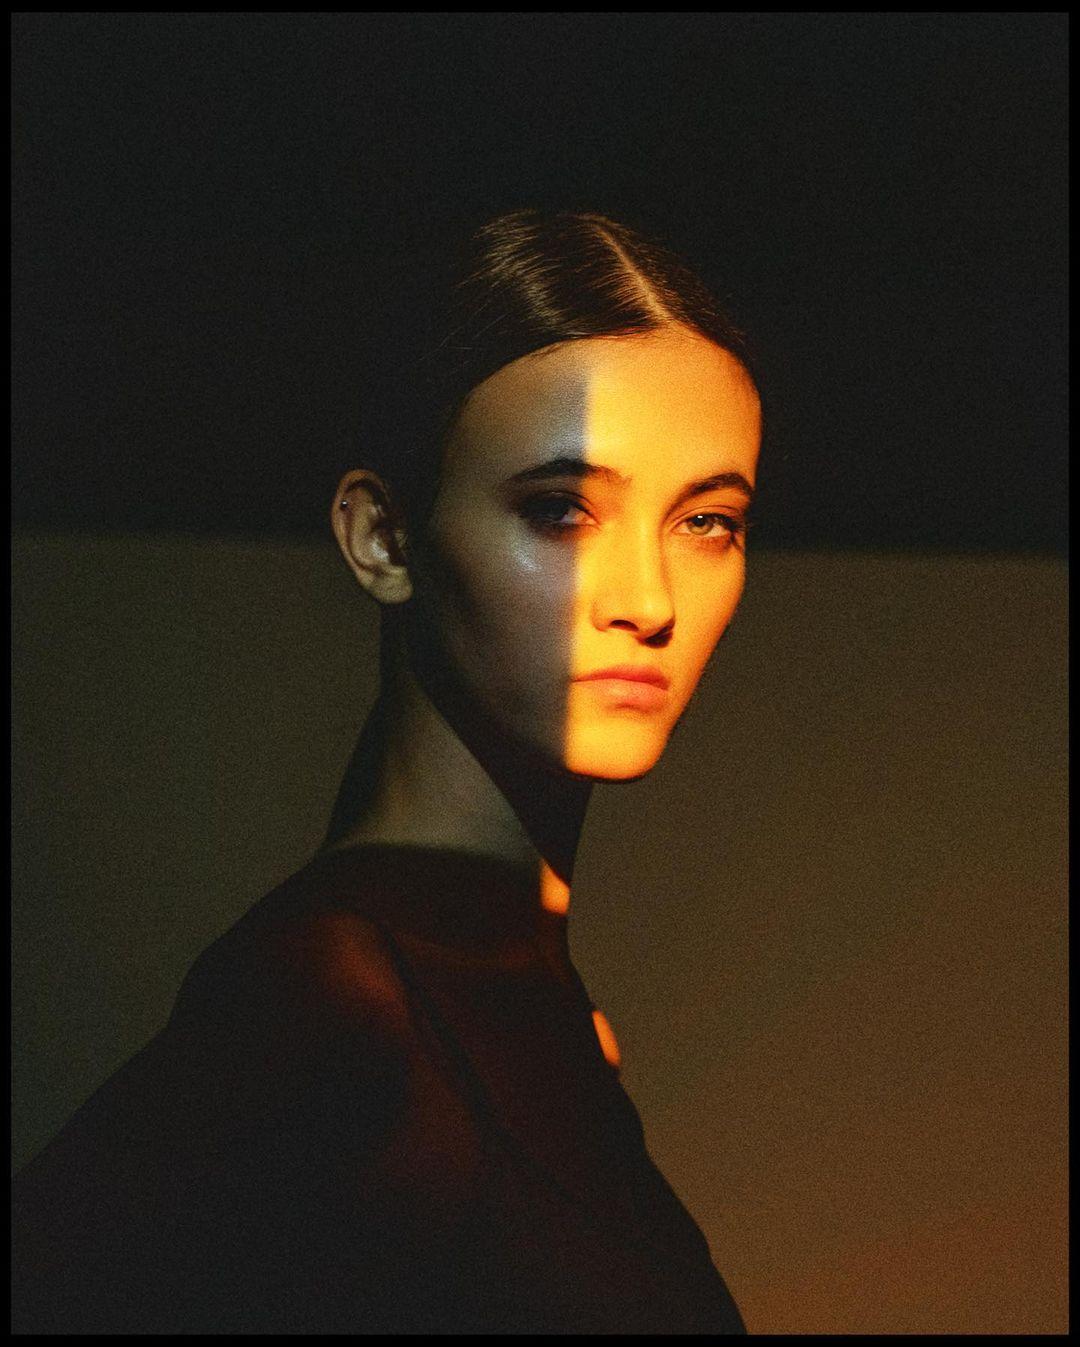 Greta Varlese by Alessio Albi